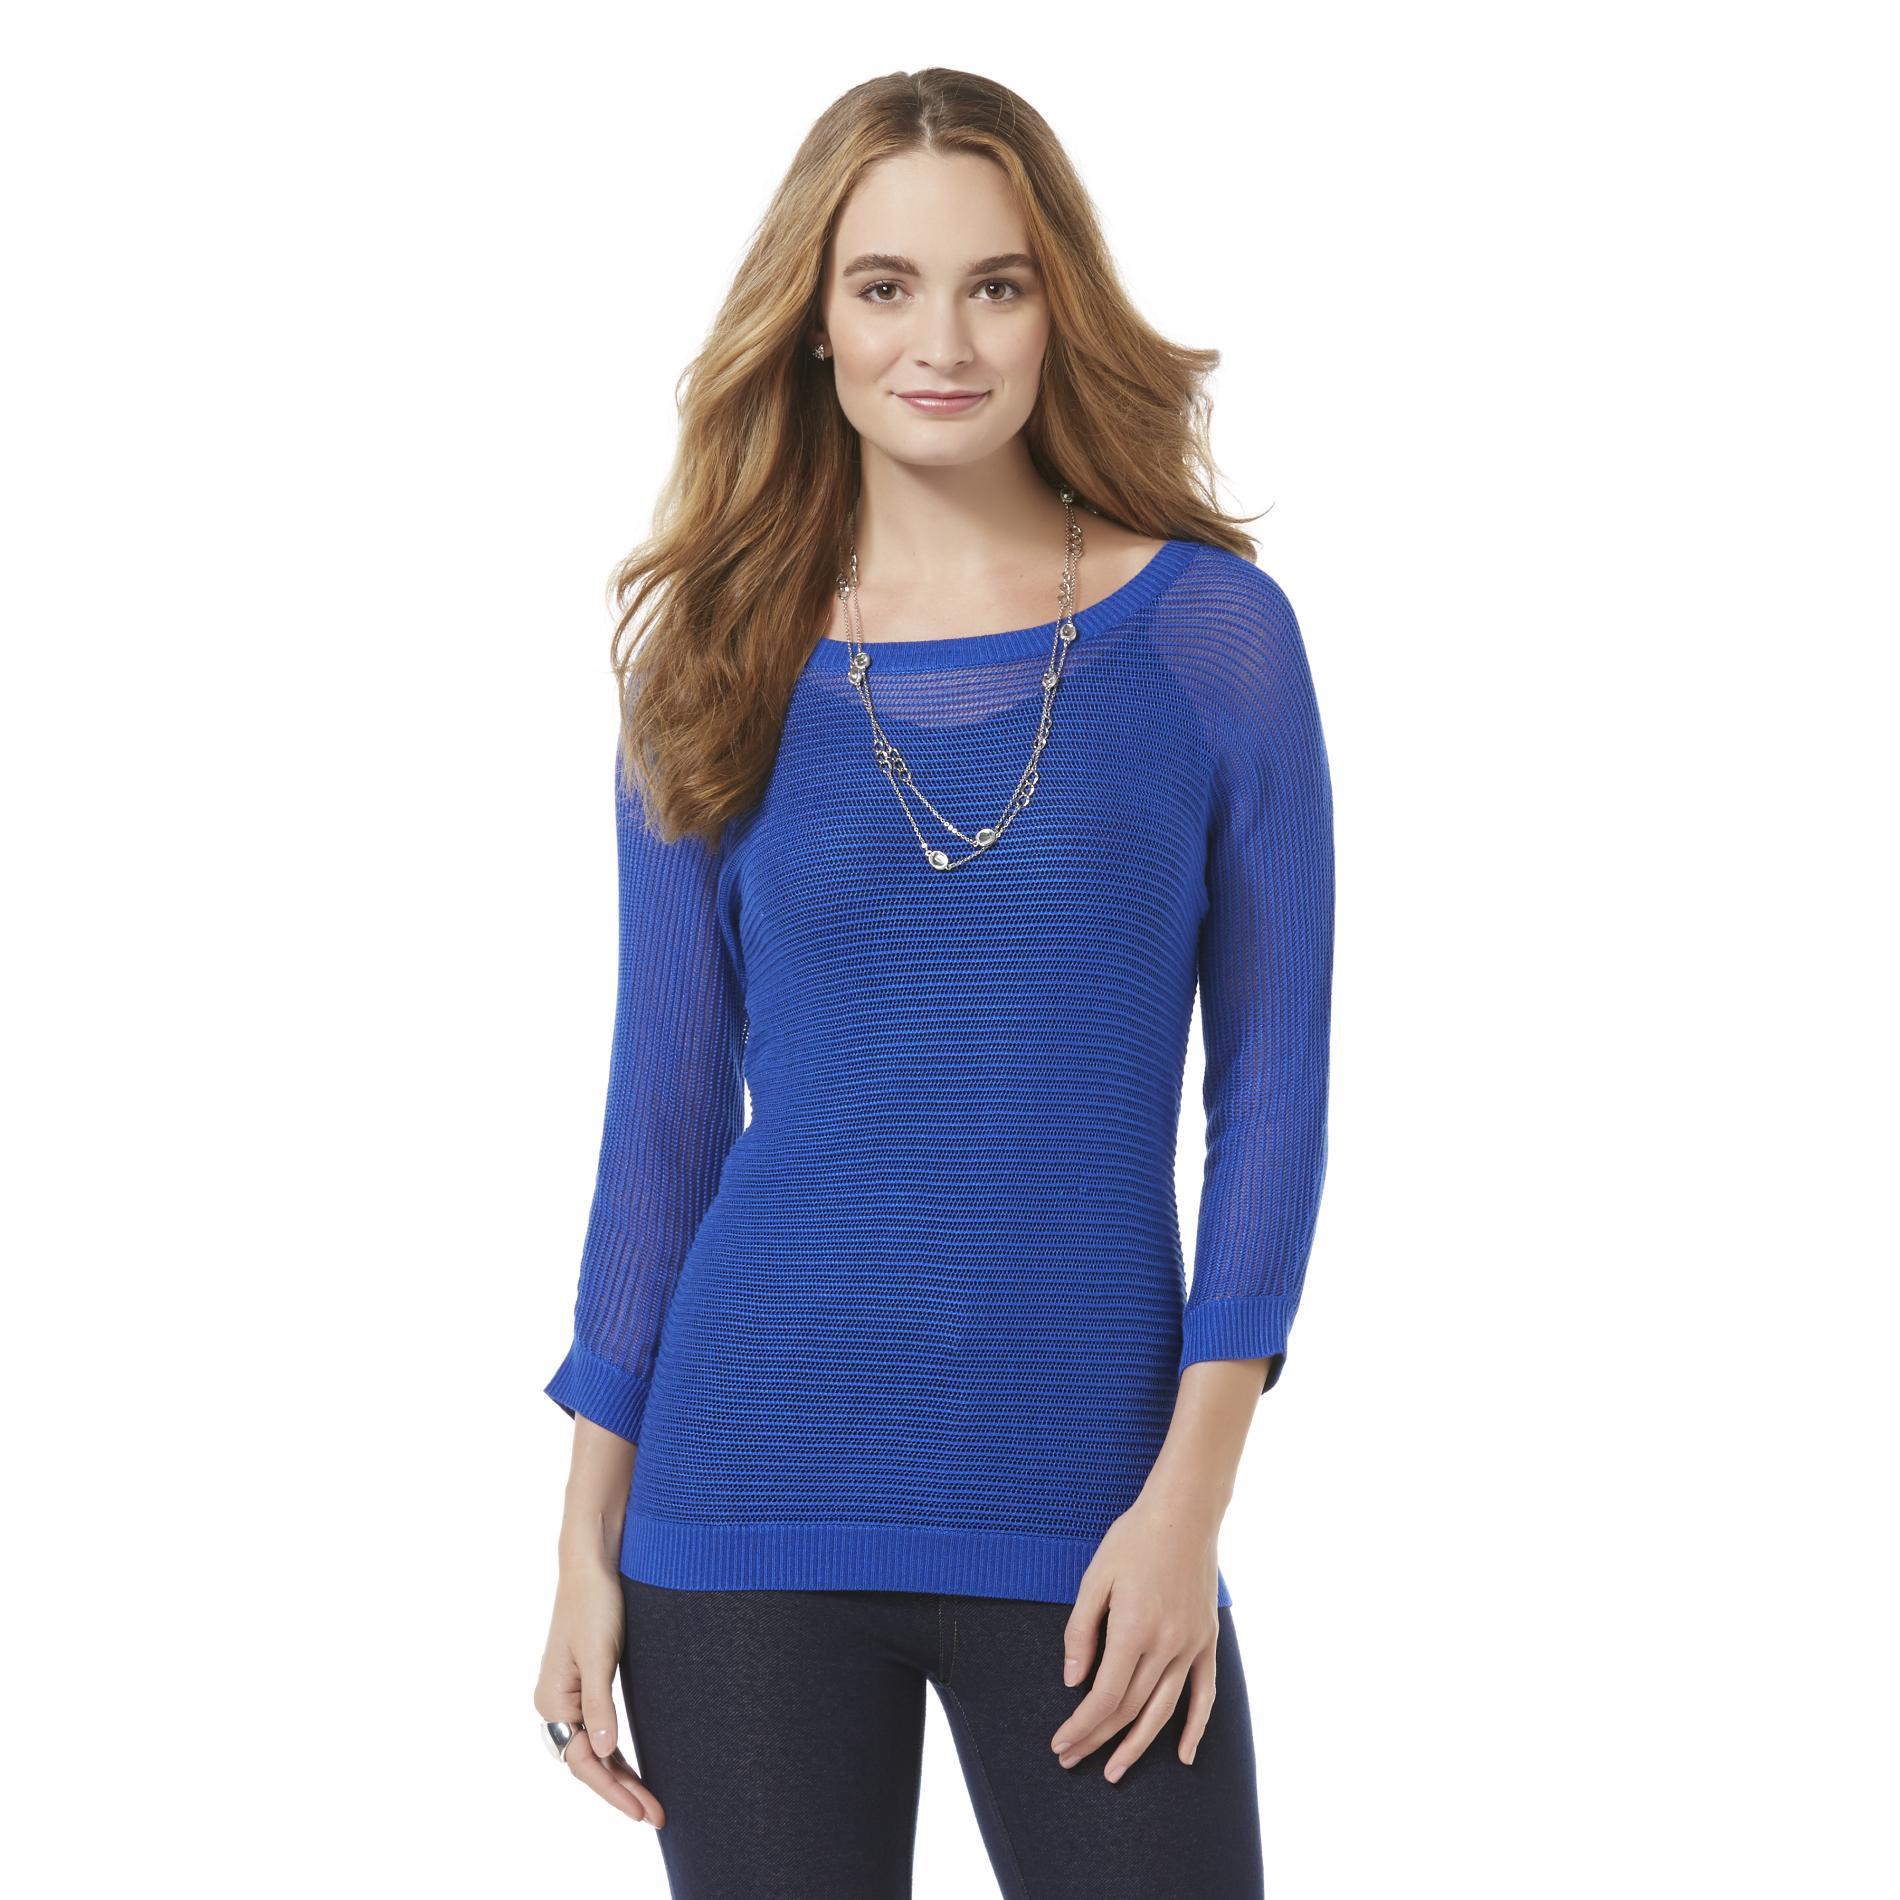 Attention Women's Three-Quarter Sleeve Sweater